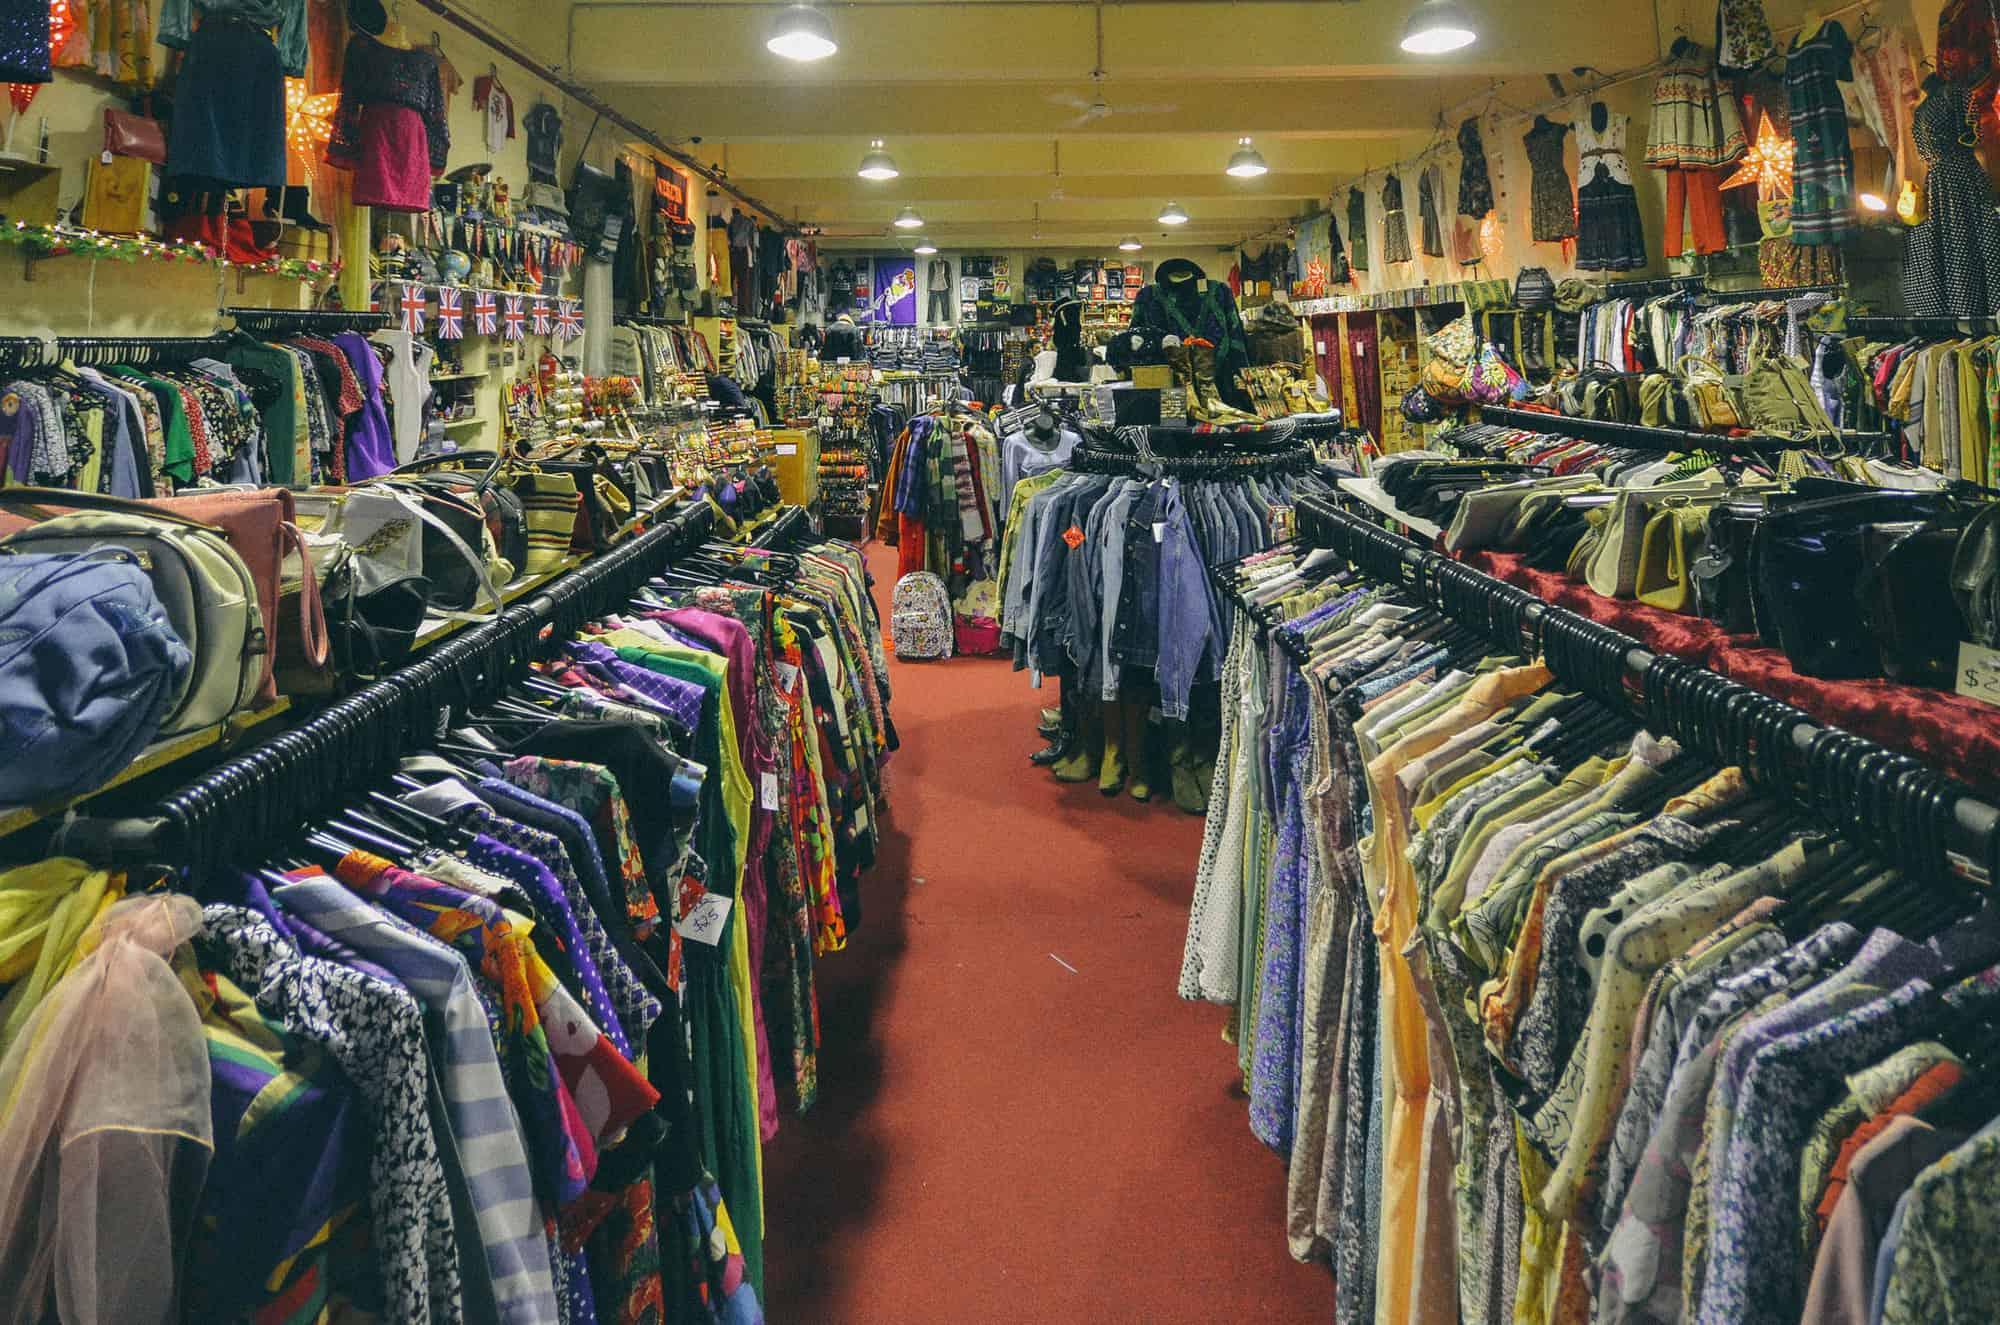 511806bee افضل اماكن شراء ملابس في اسطنبول - موسوعة